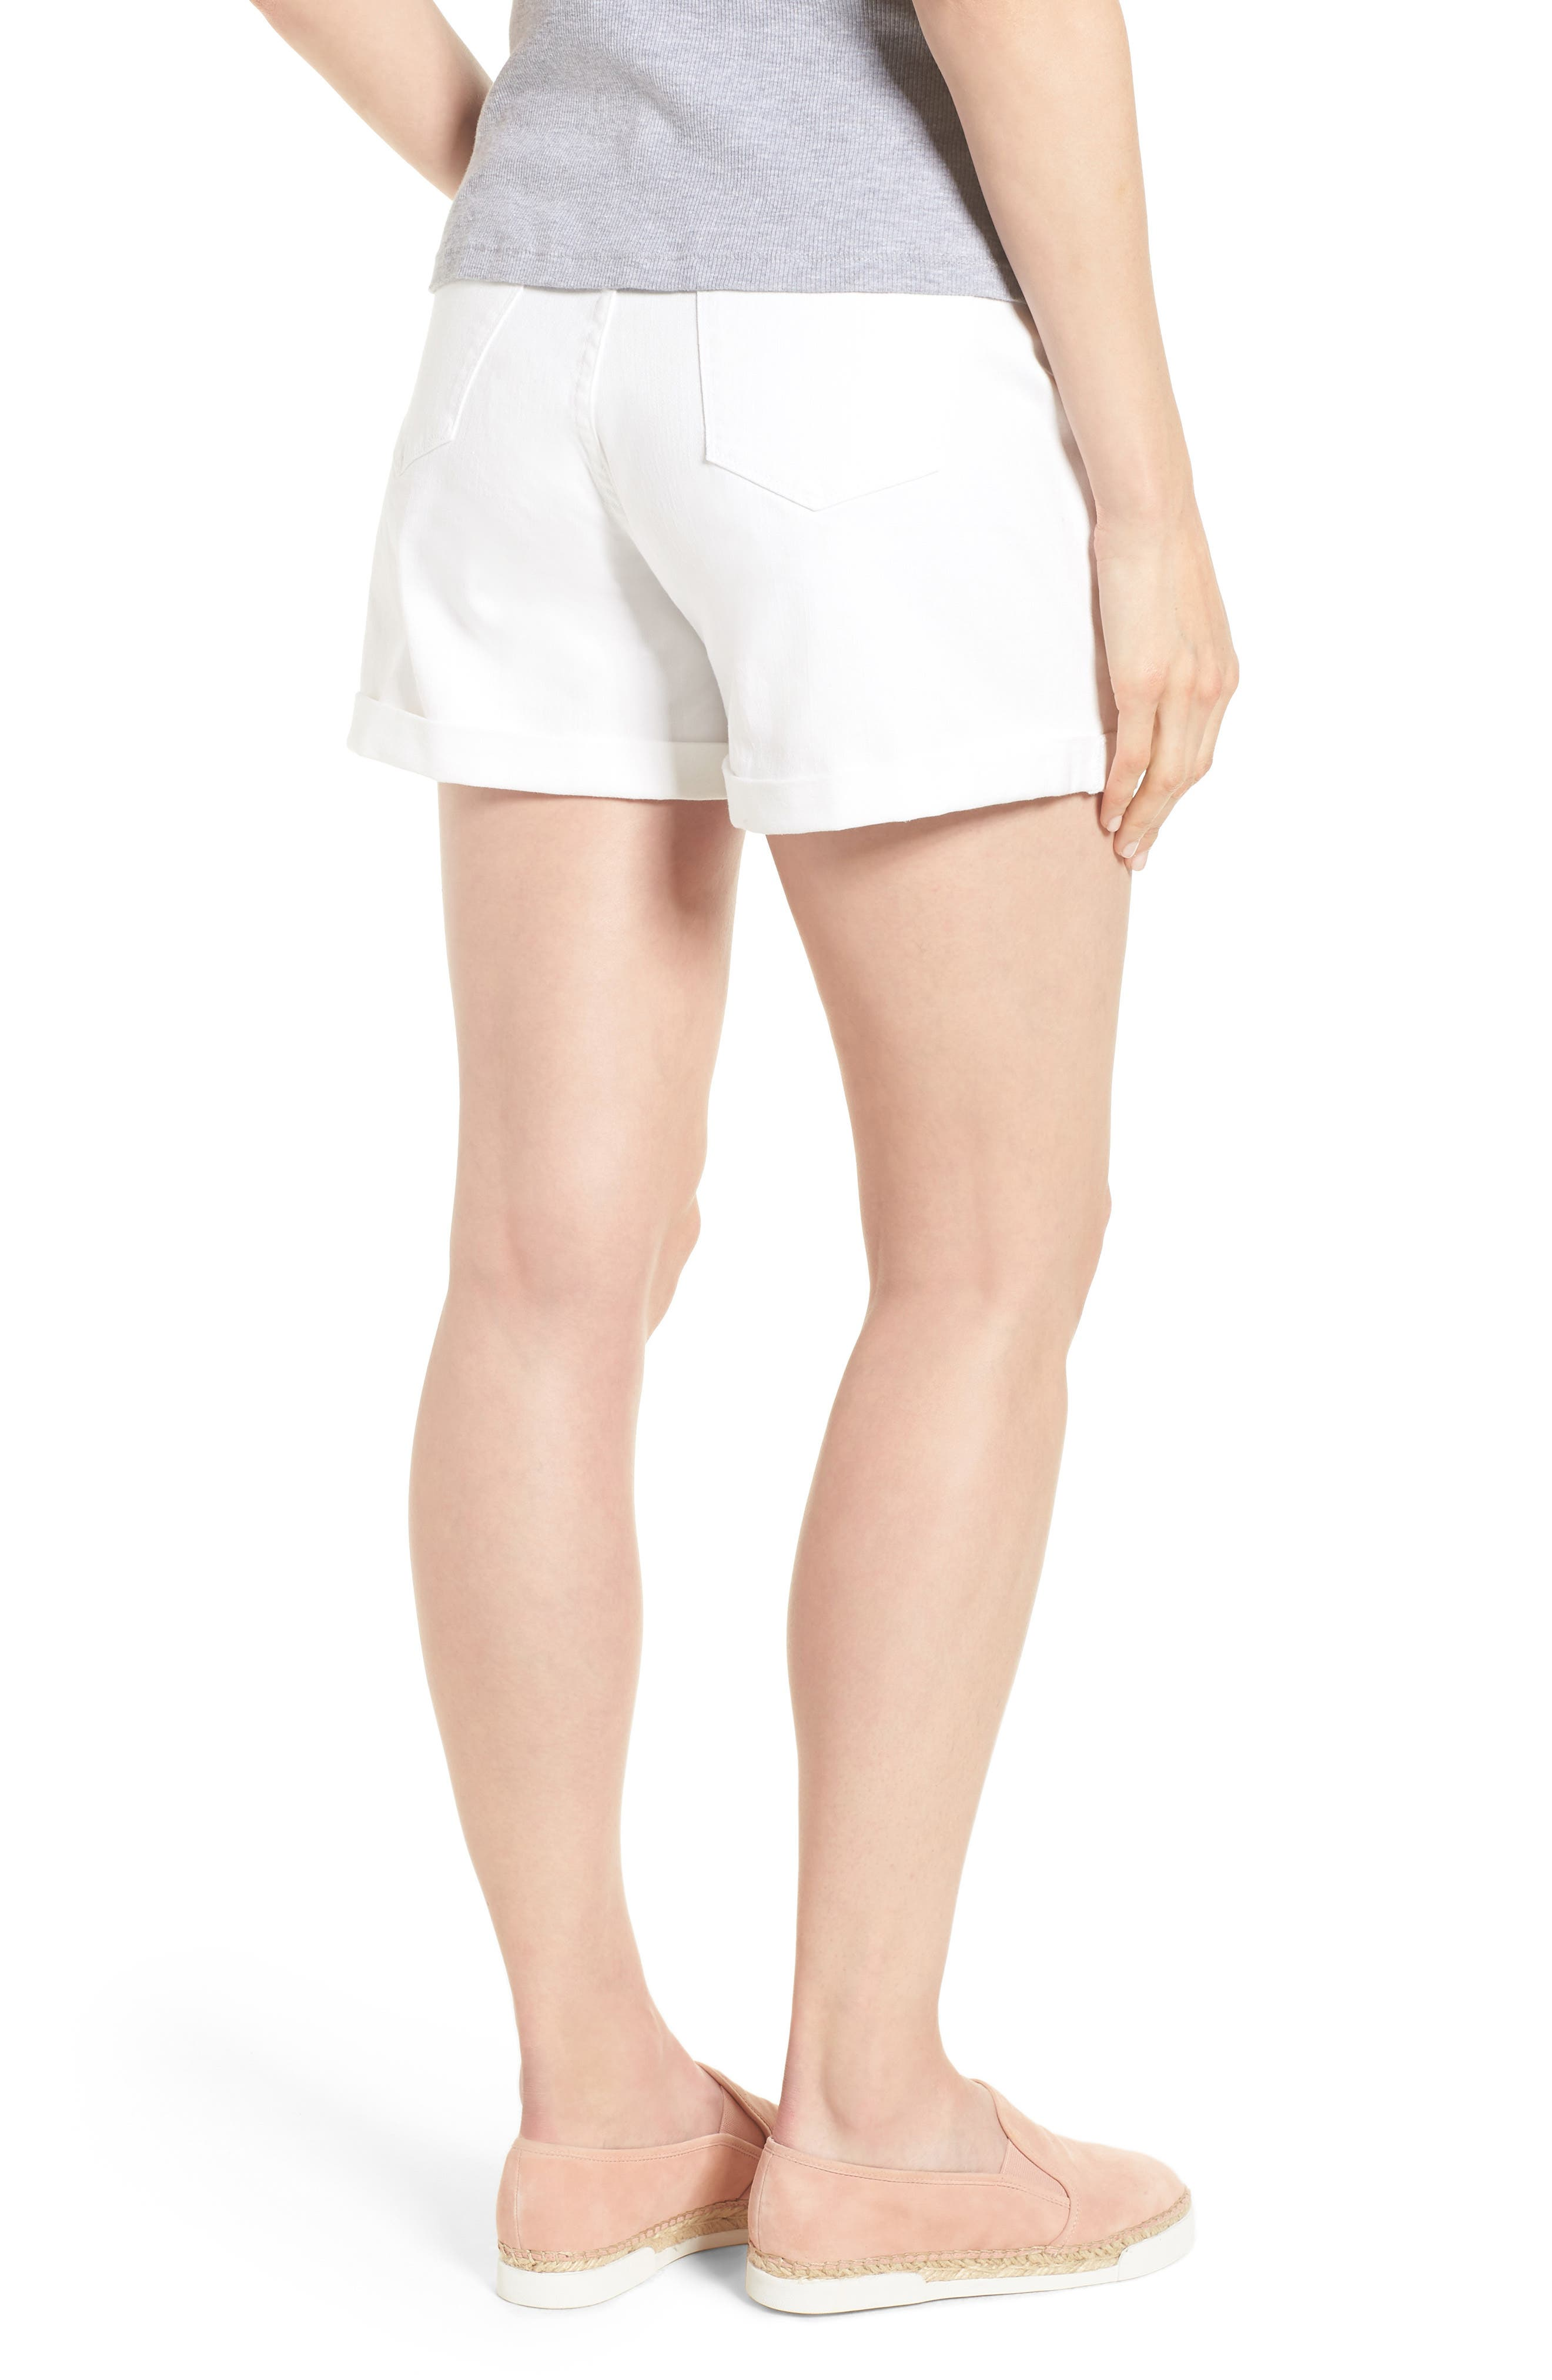 Mia Maternity Boyfriend Shorts,                             Alternate thumbnail 2, color,                             White